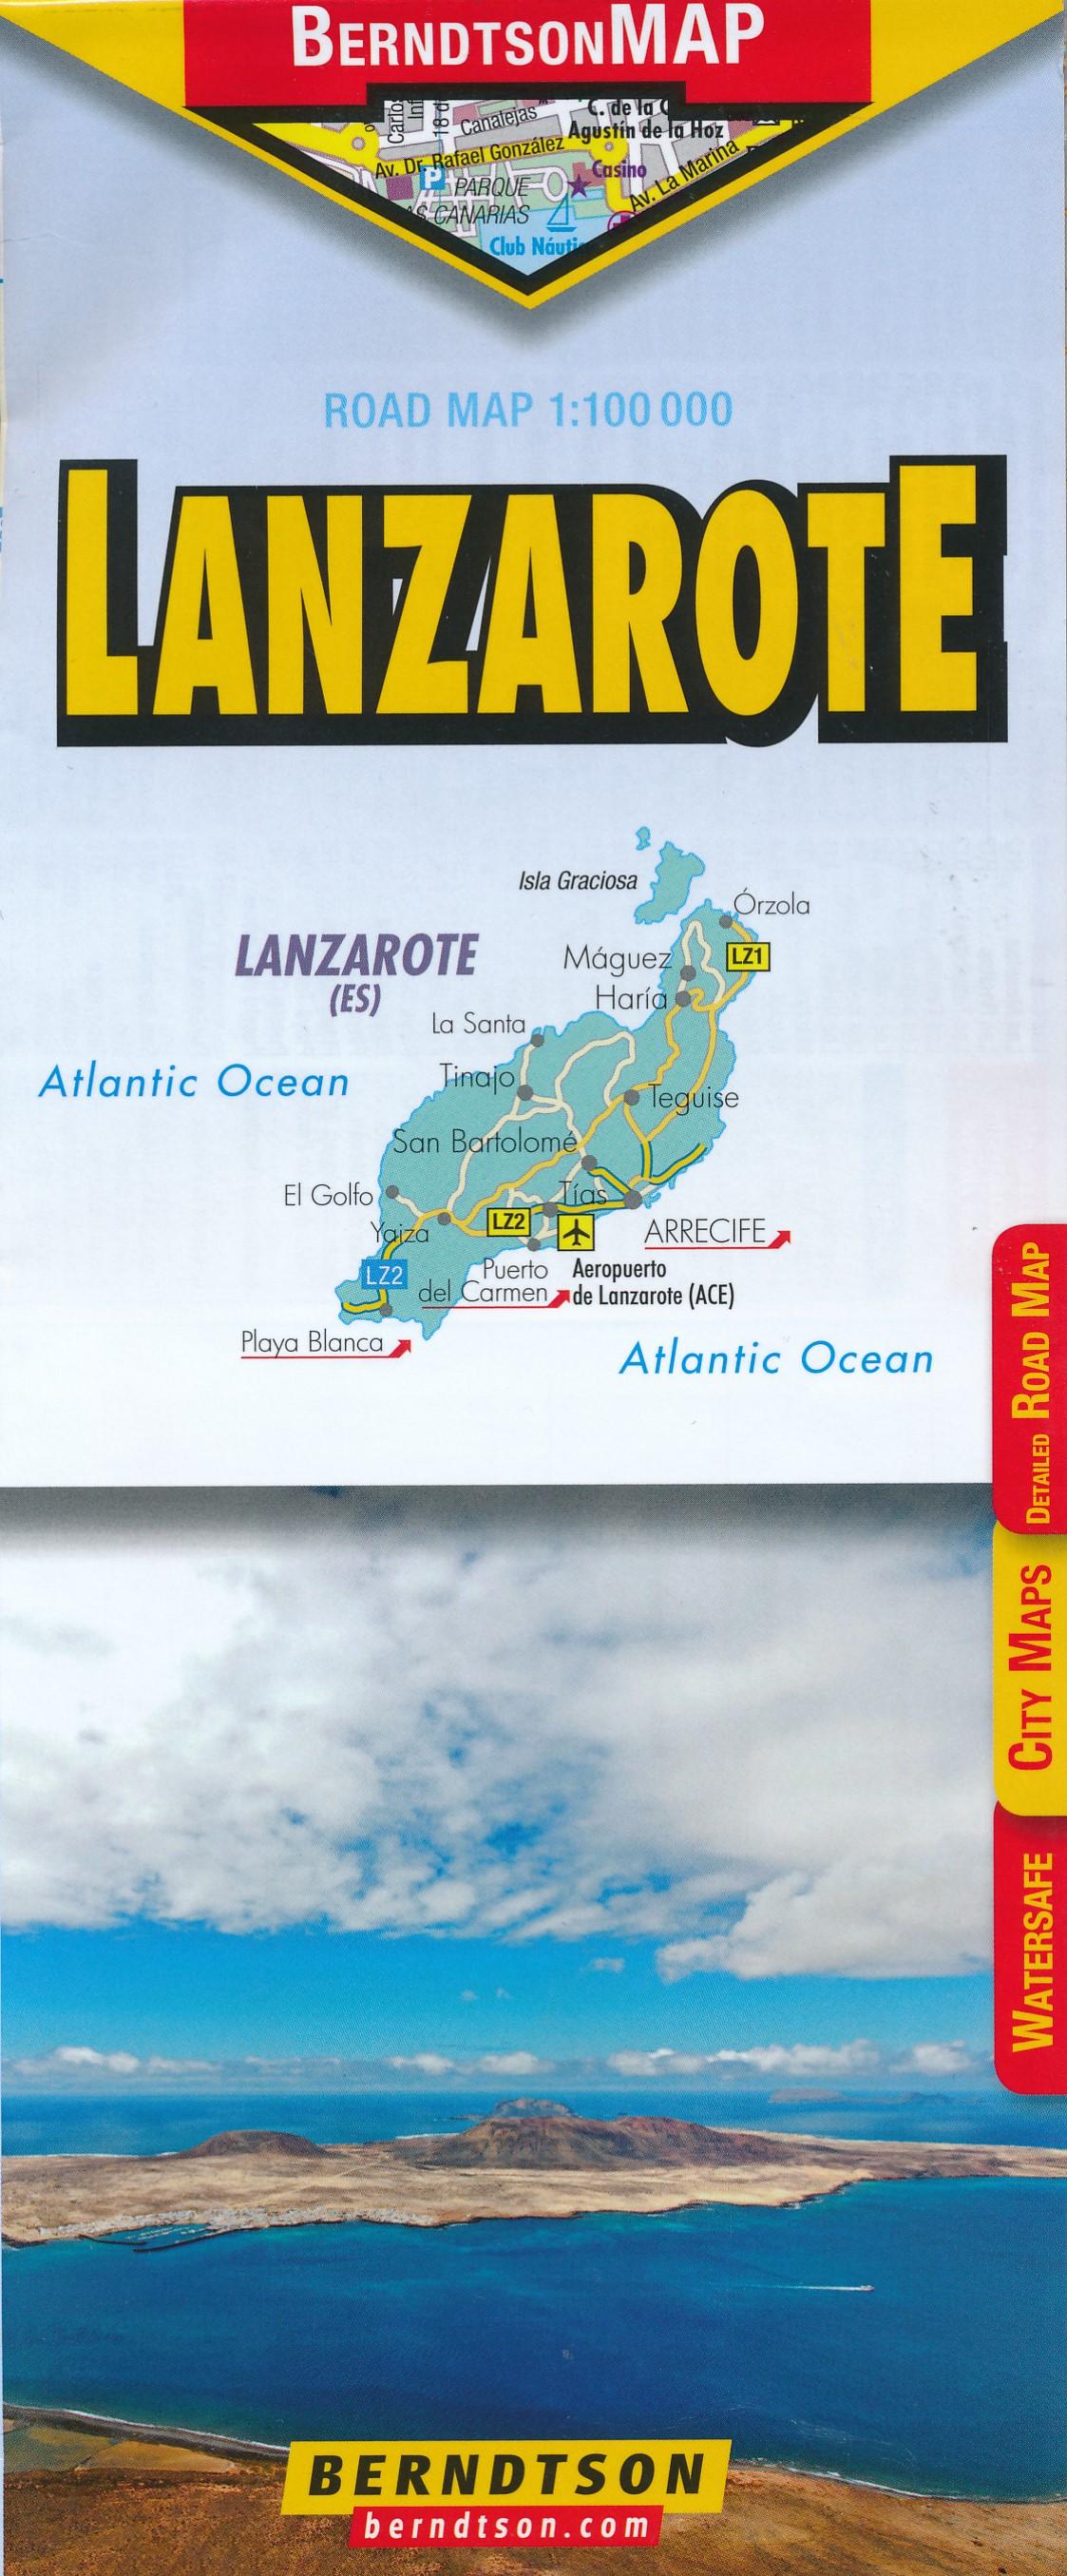 Wegenkaart - landkaart Lanzarote   Berndtson